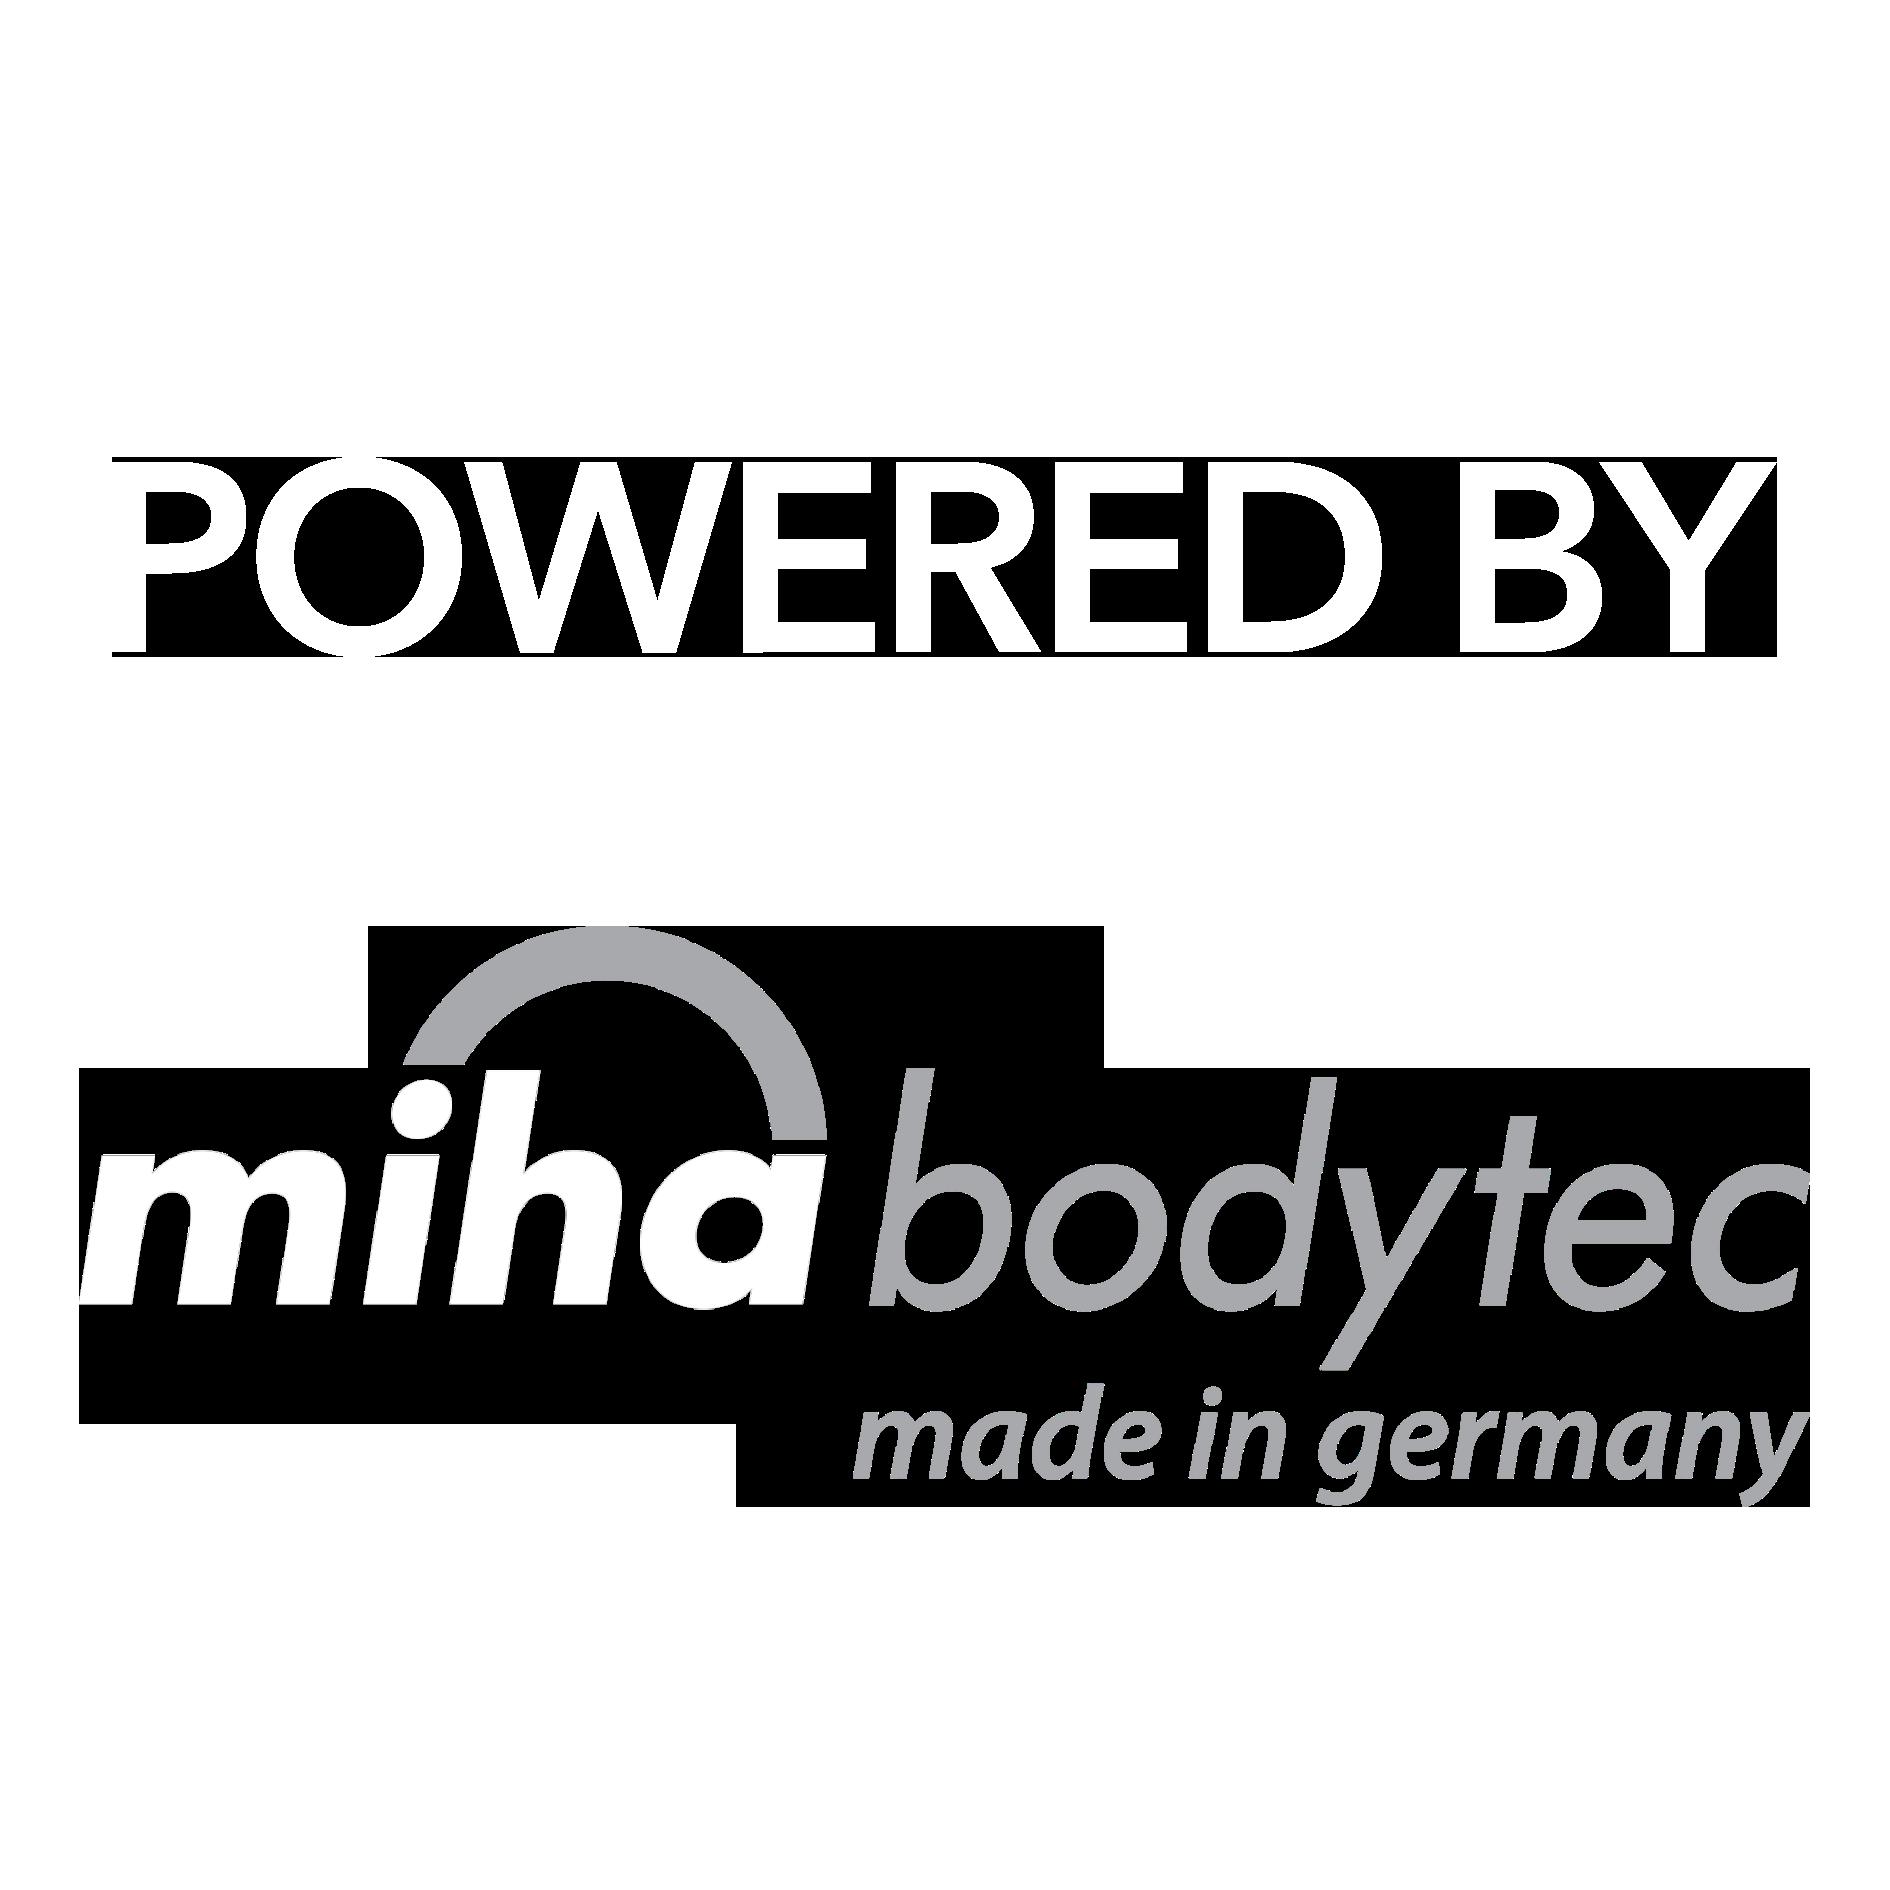 Powered by MIHA BODYTEC